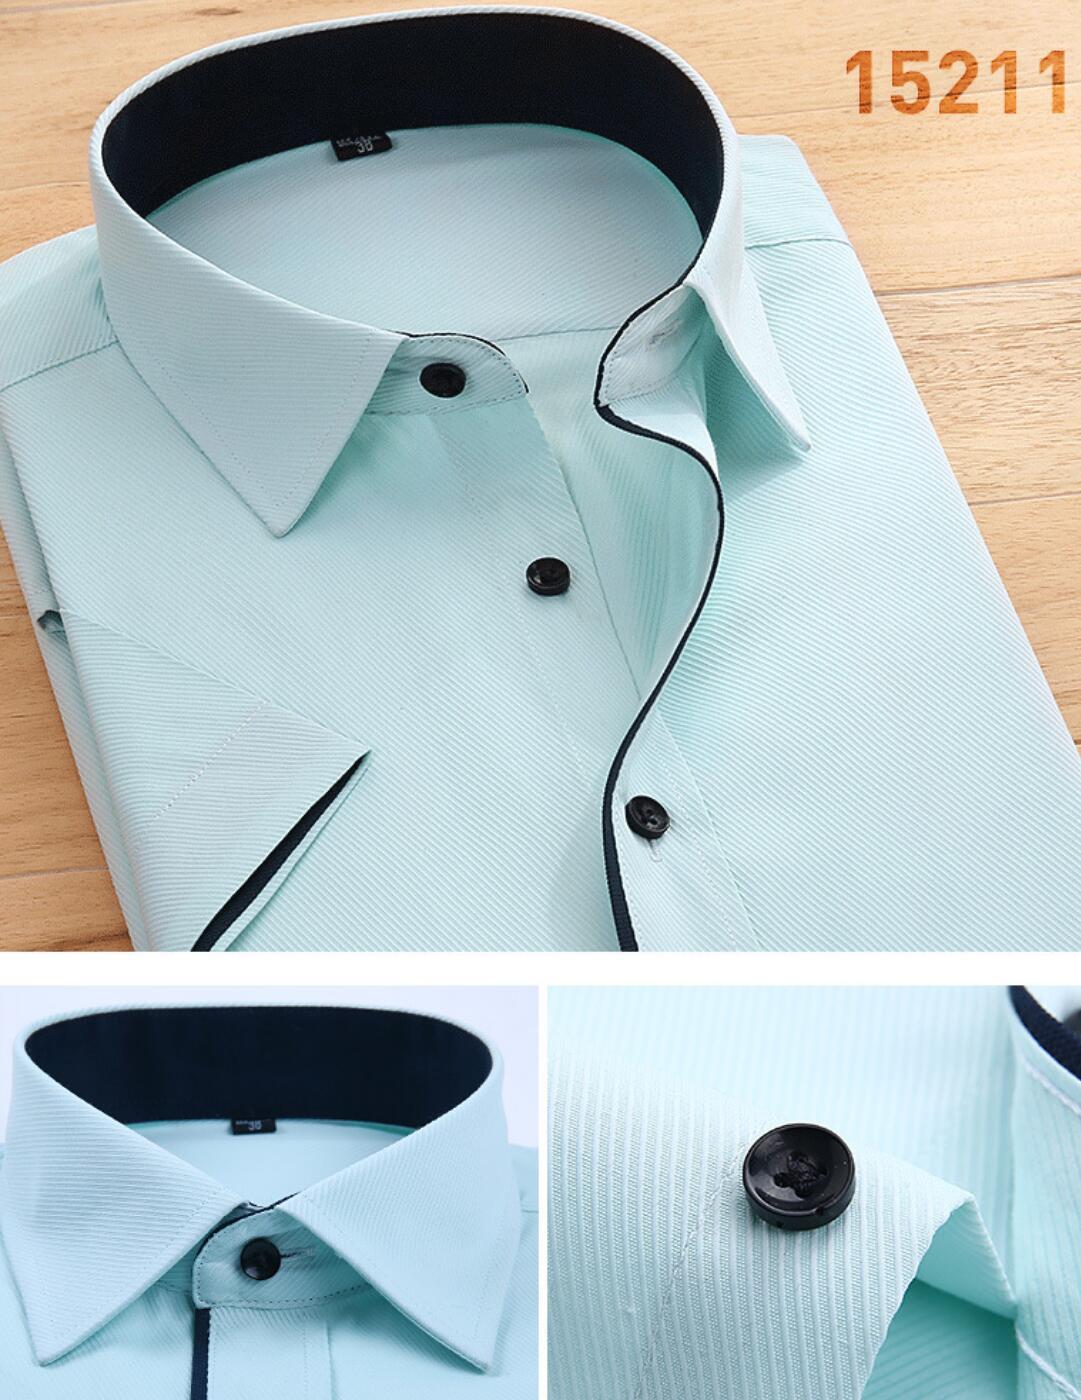 2020 HOT Summer Solid Color Shirt Men's  Sleeve White Shirt Em8 Autumn Clothes Summer  KJJ-01-03